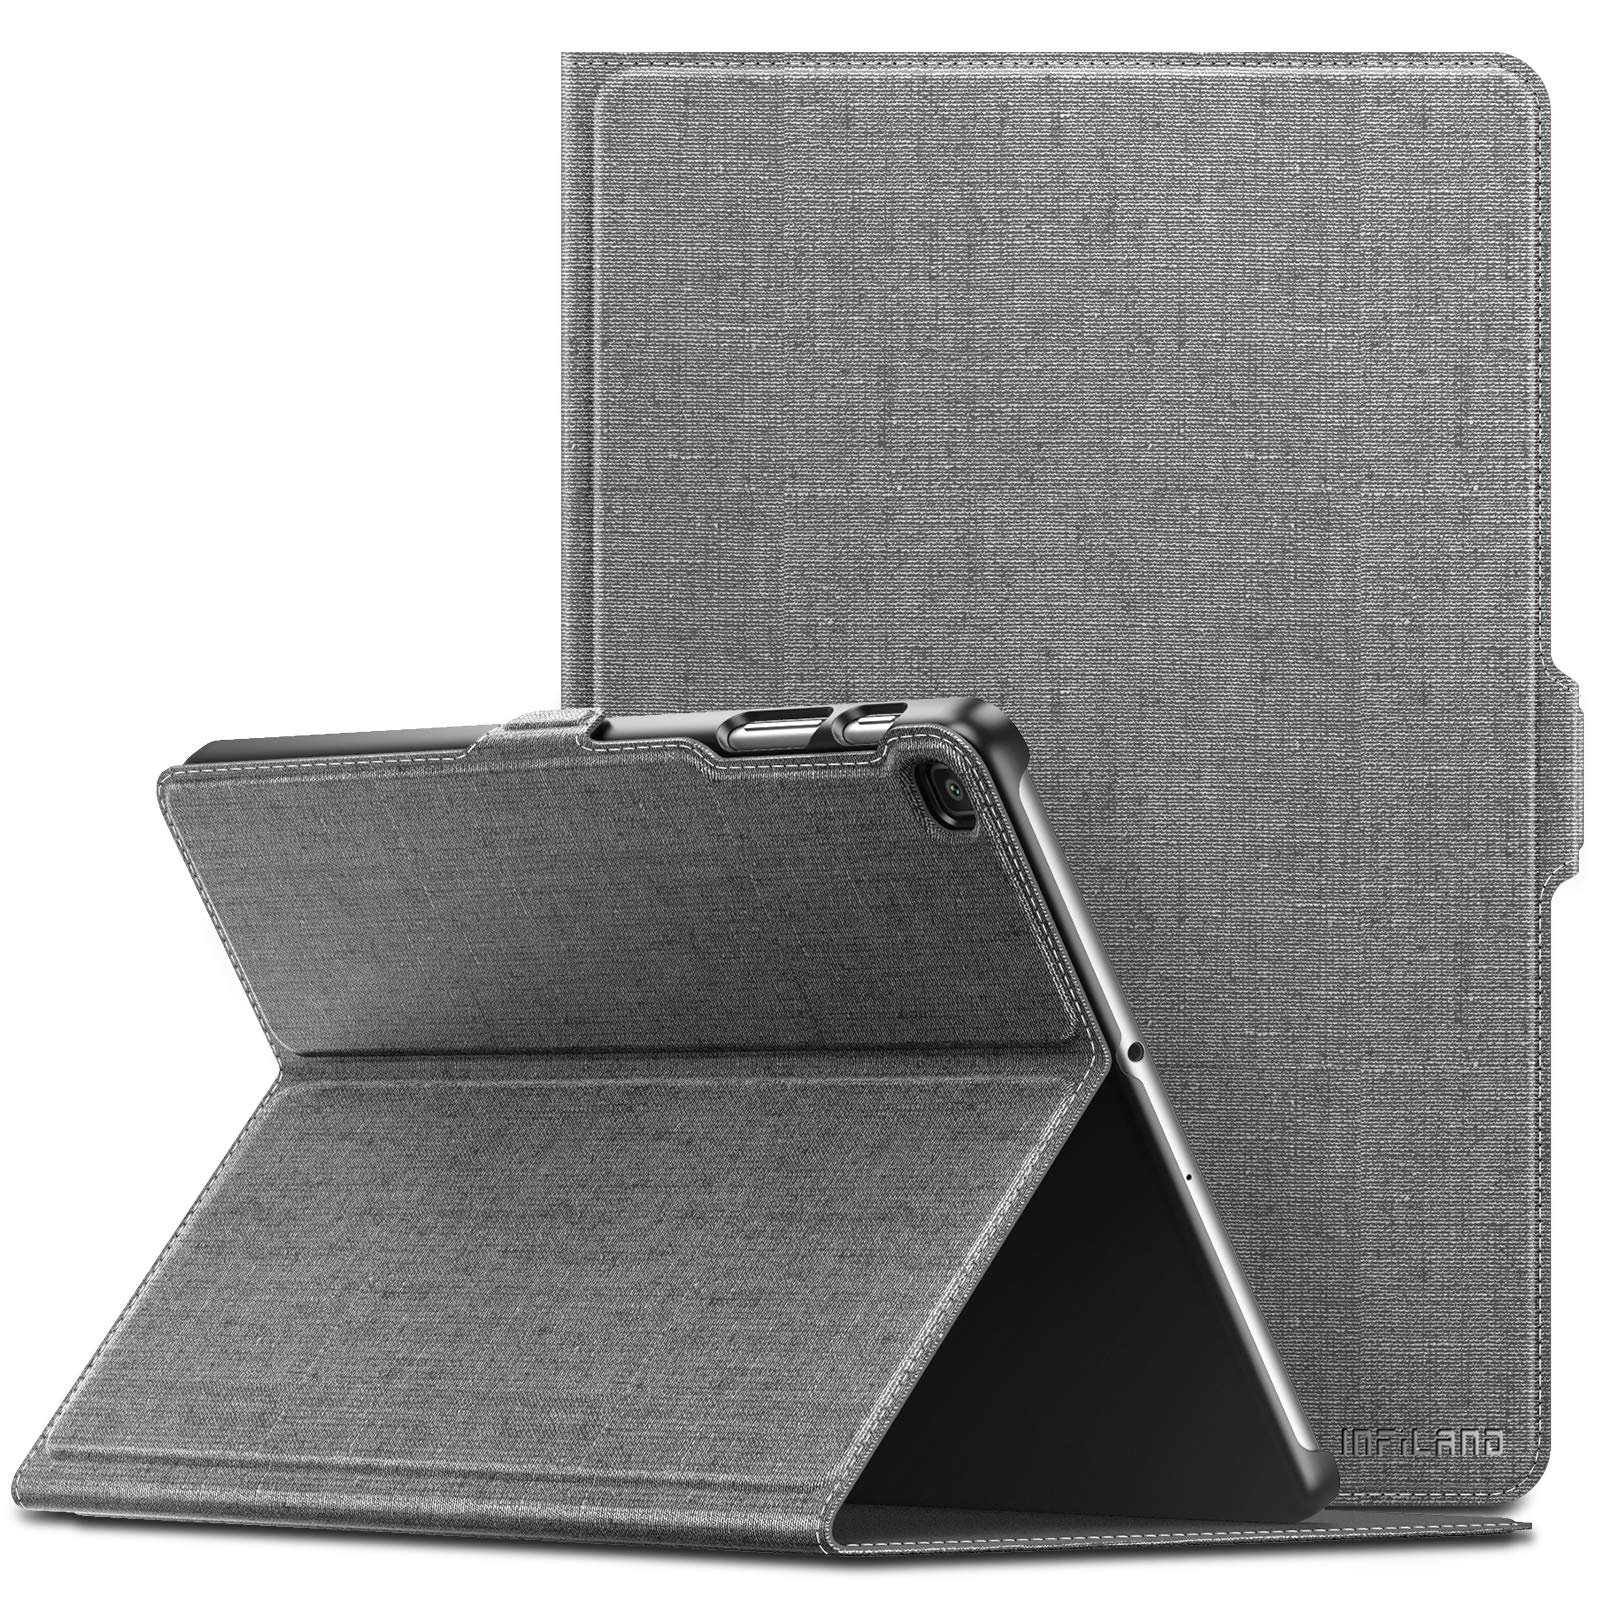 Funda Samsung Galaxy Tab A 10.1 Sm-t510 (2019) Infiland [7pk95s3y]